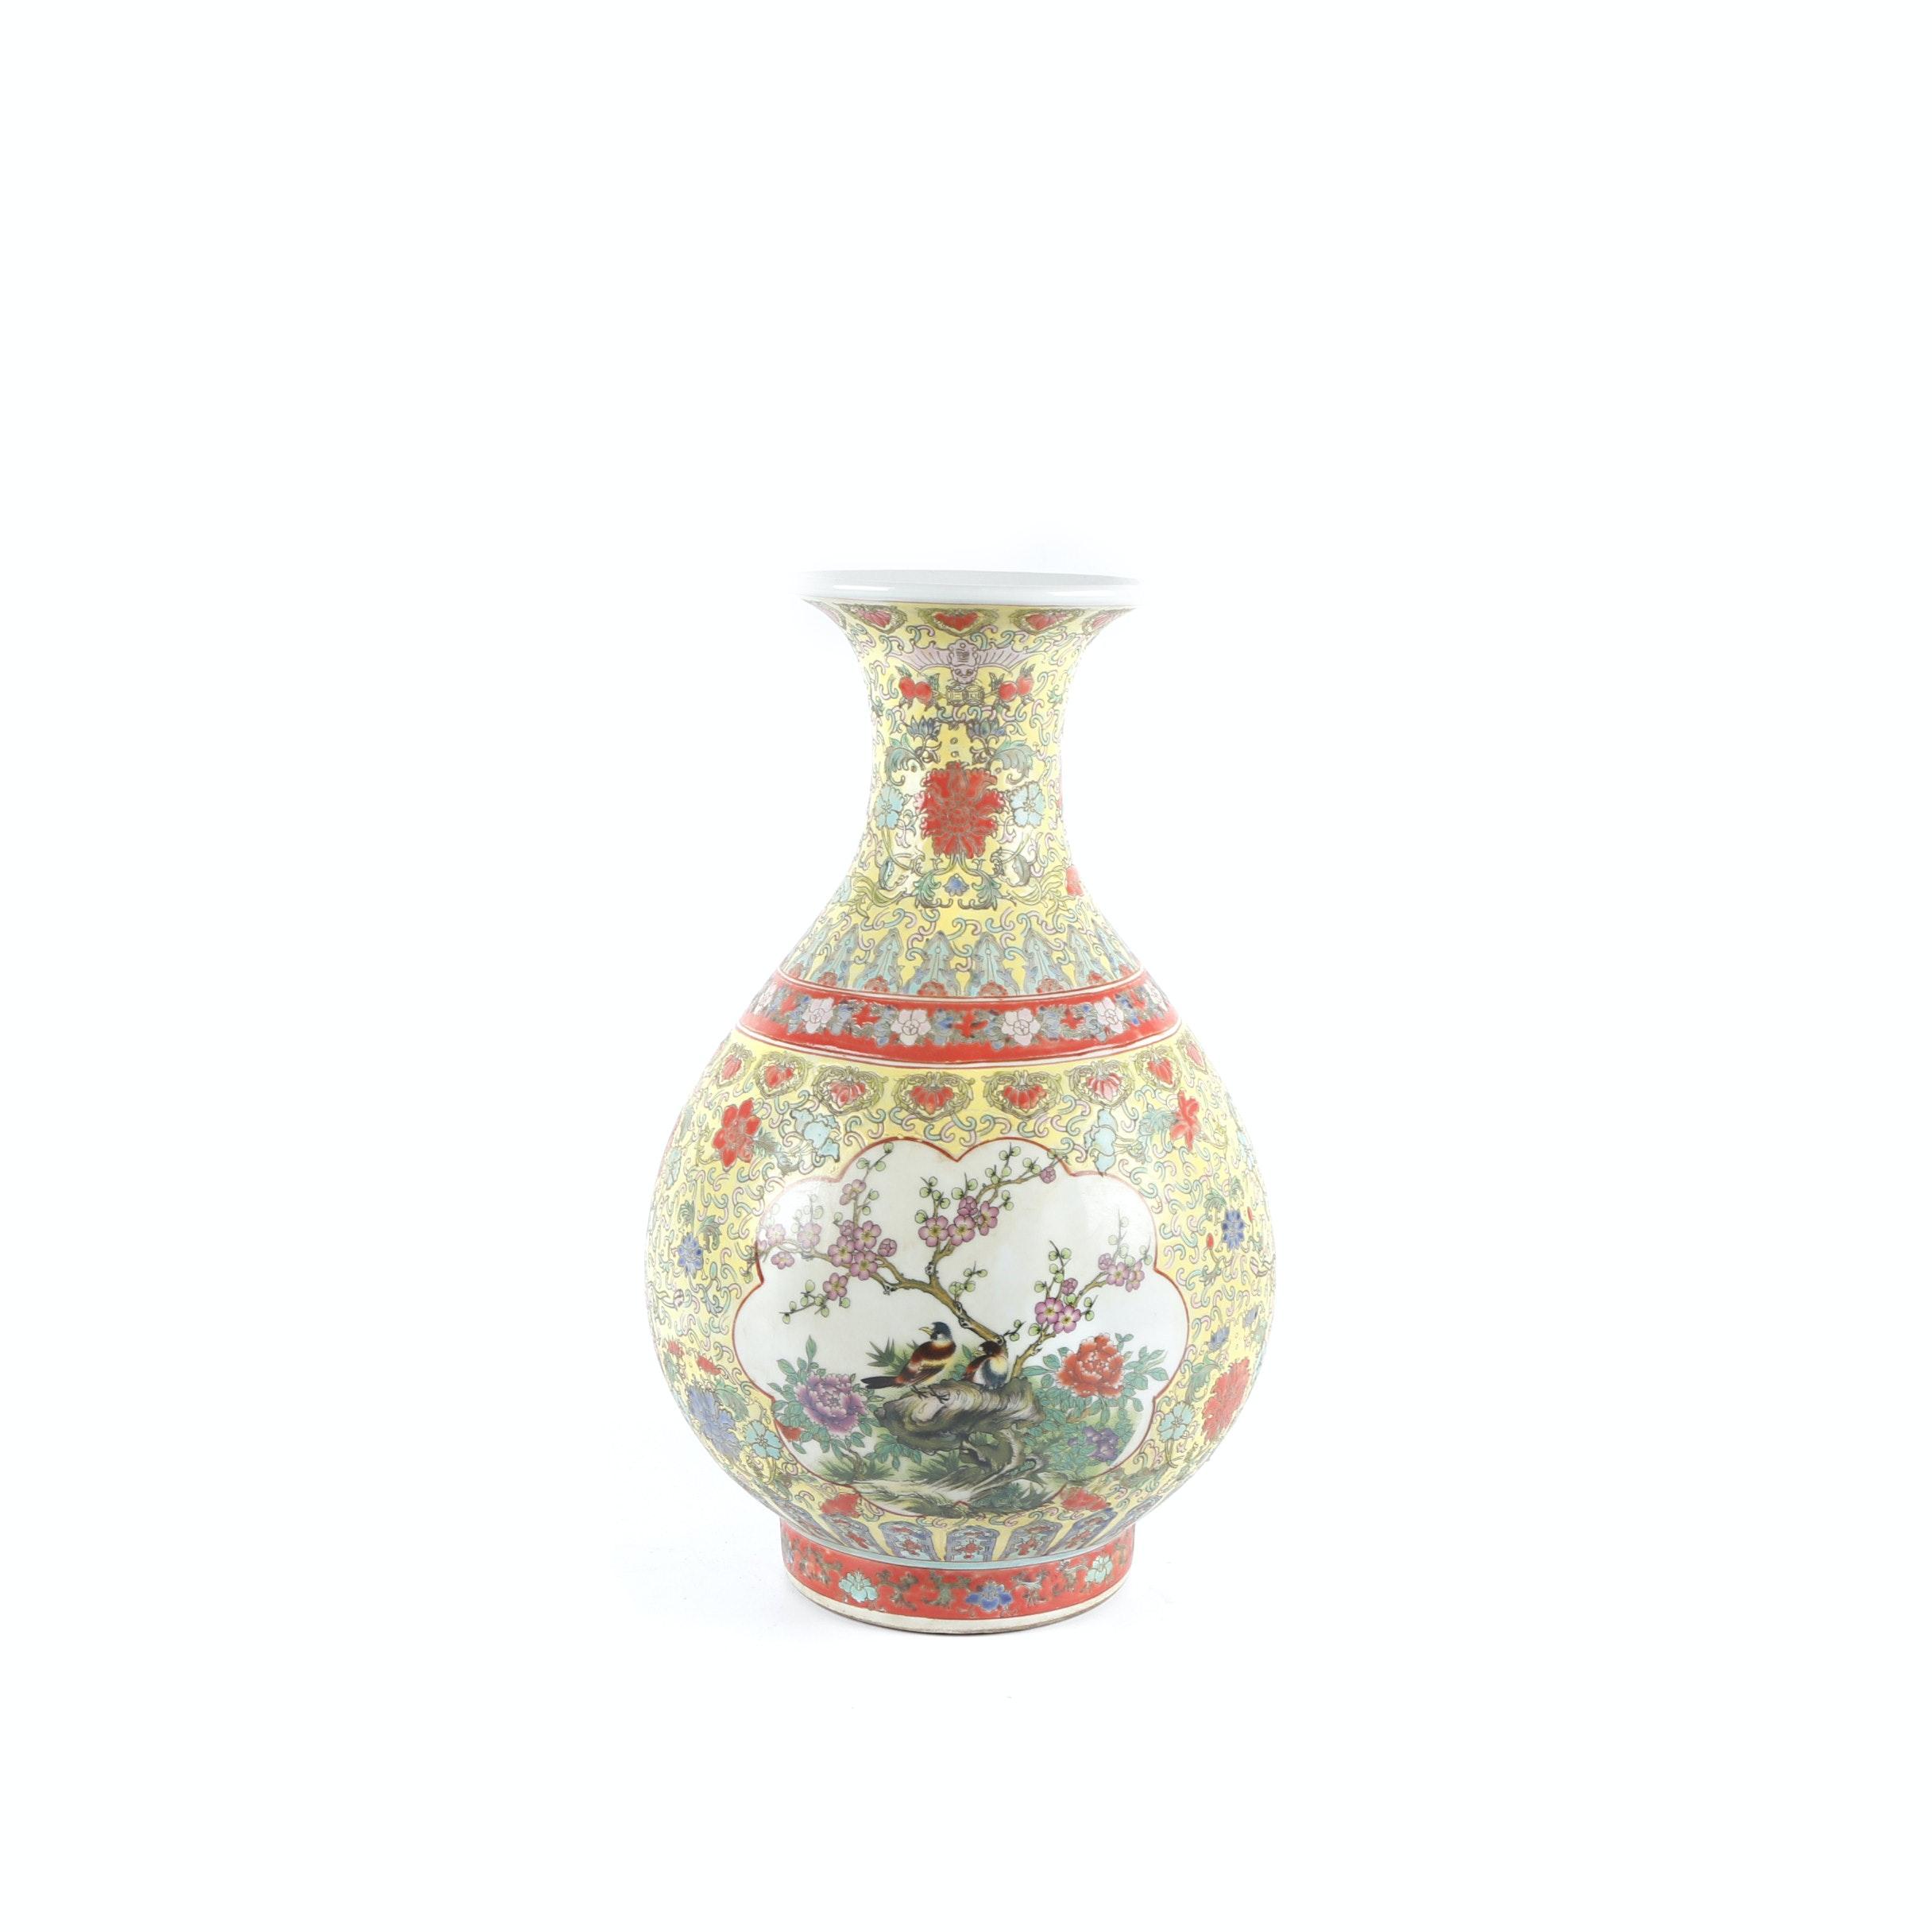 Chinese Famille Jaune Style Flower and Bird Themed Ceramic Vase